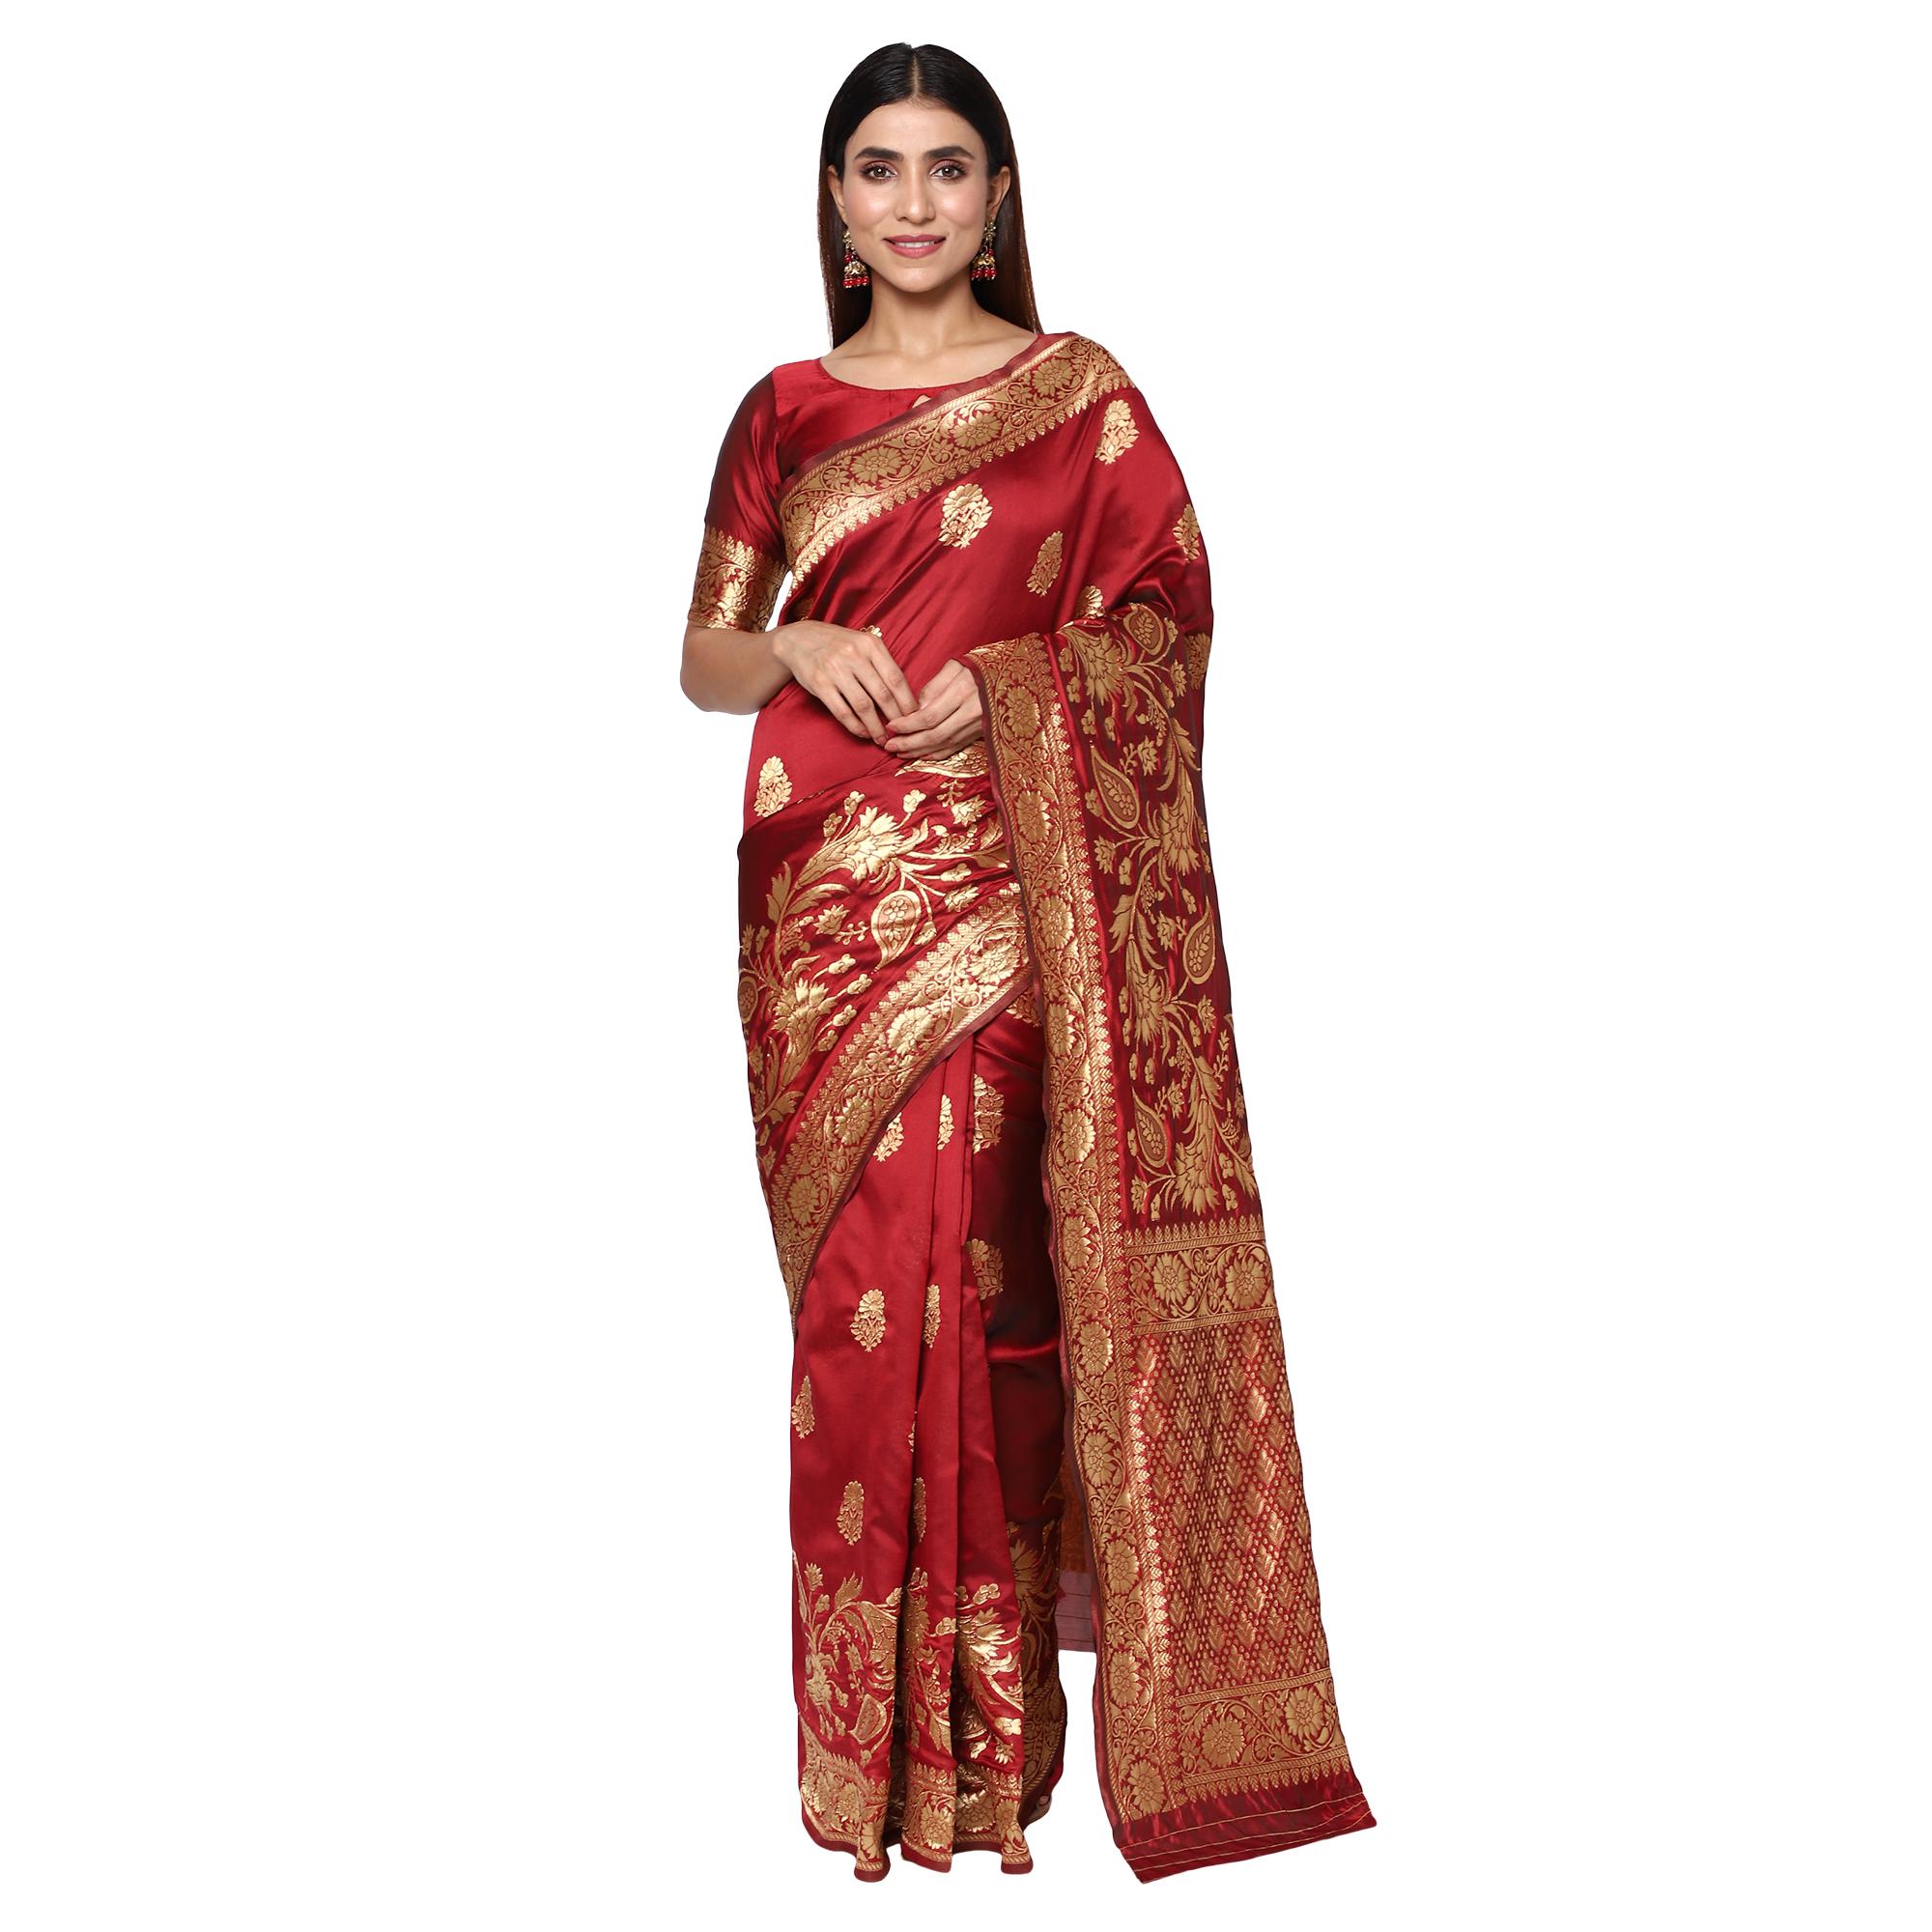 Glemora | Glemora Maroon Fancy Ethnic Wear Silk Blend Banarasi Traditional Saree